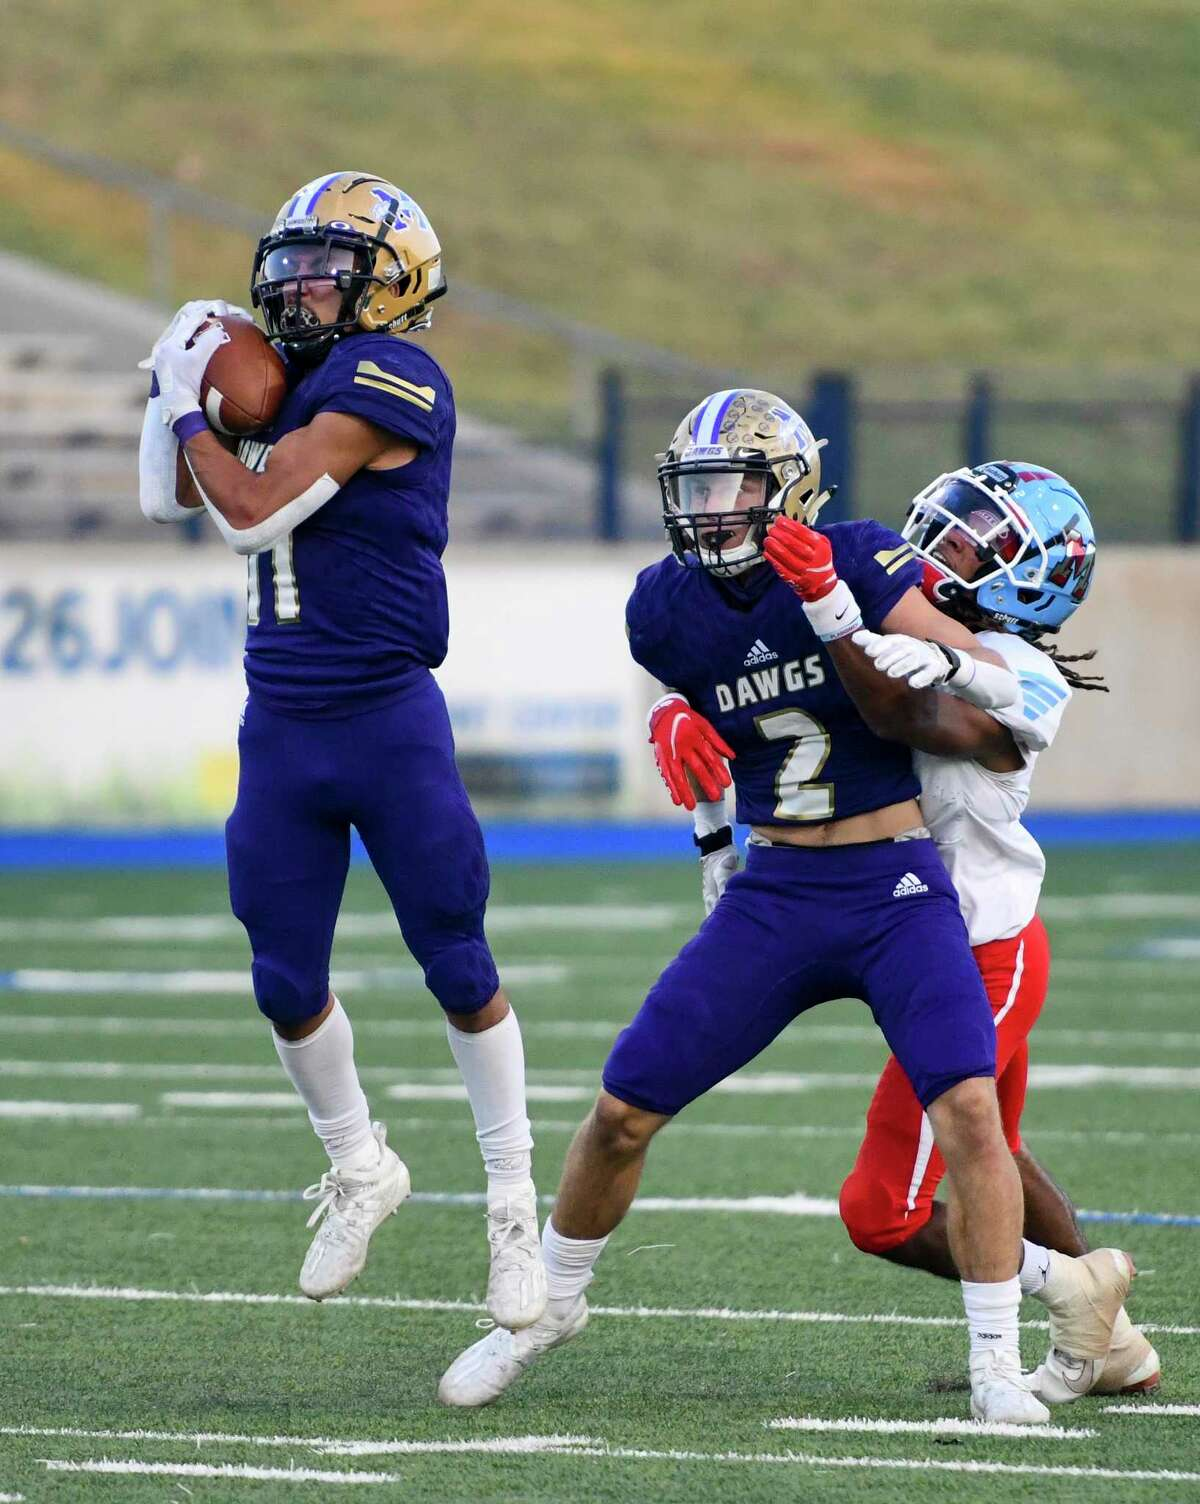 Midland High?•s Michael Gomez intercepts the ball as Jakob Vines blocks Monterey?•s MJ Singleton on Thursday, Oct. 8, 2020 at Grande Communications Stadium. Jacy Lewis/Reporter-Telegram